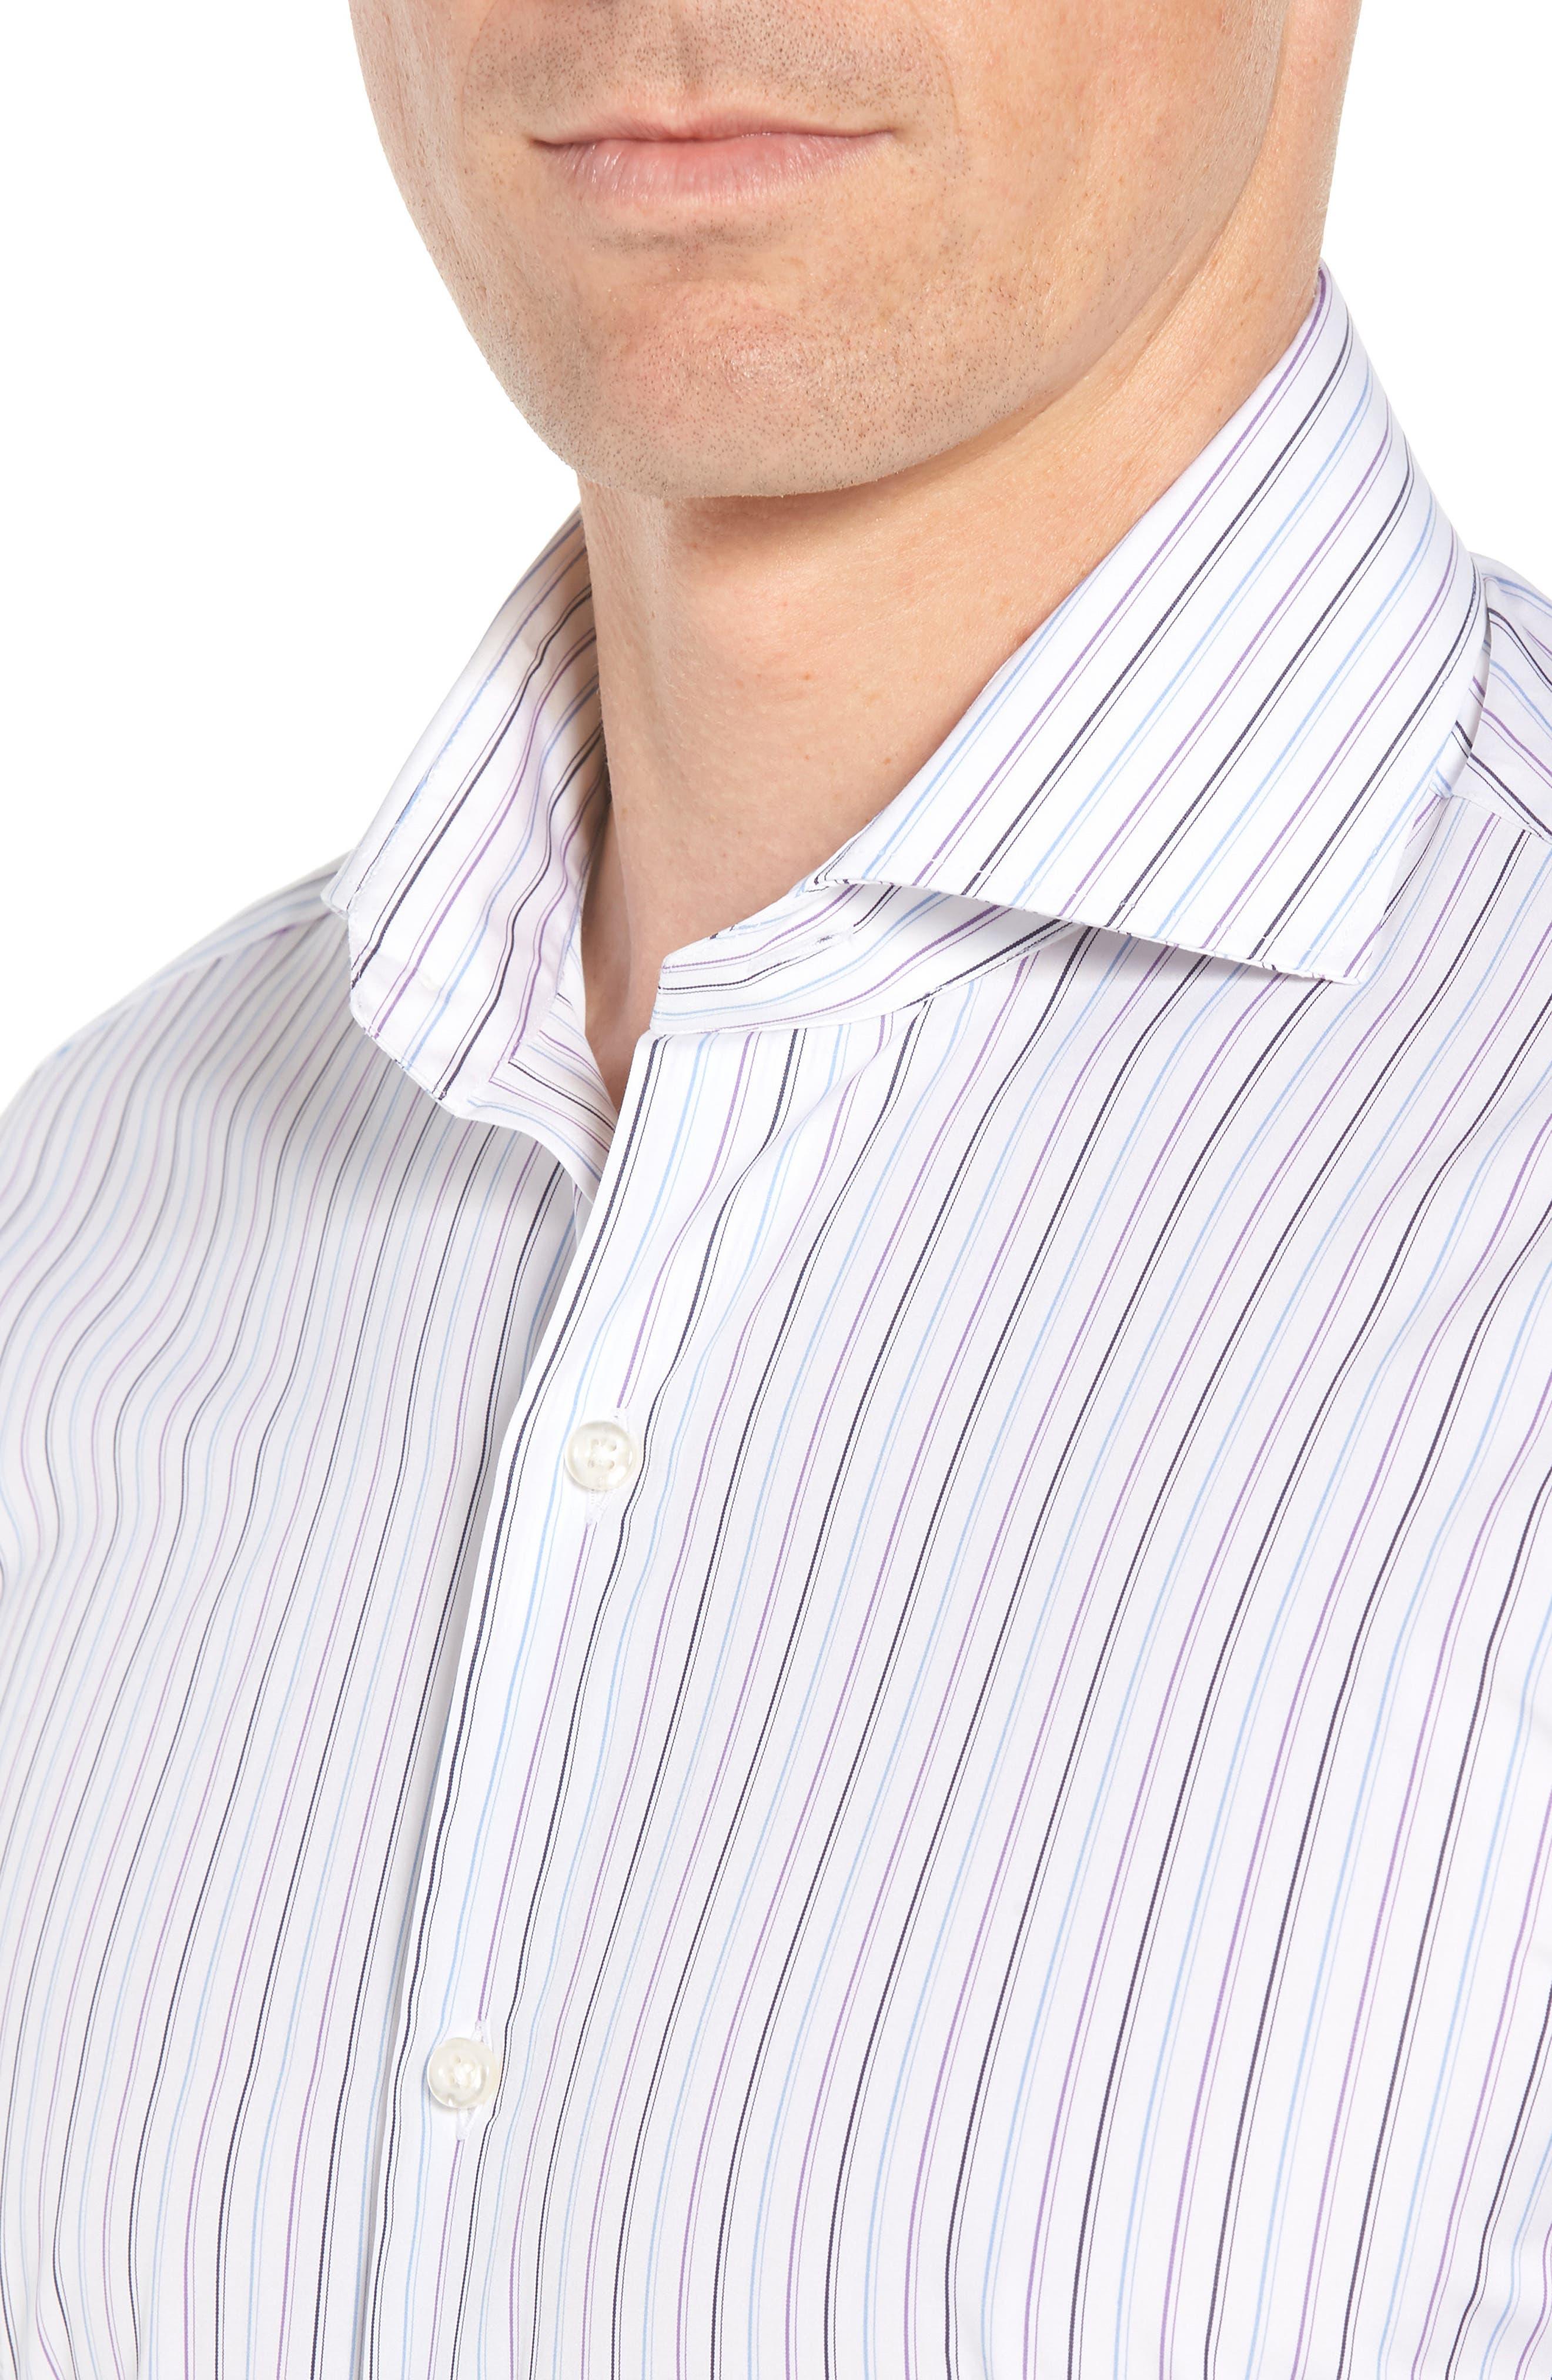 Regular Fit Stripe Dress Shirt,                             Alternate thumbnail 2, color,                             WHITE/ BLUE/ PURPLE